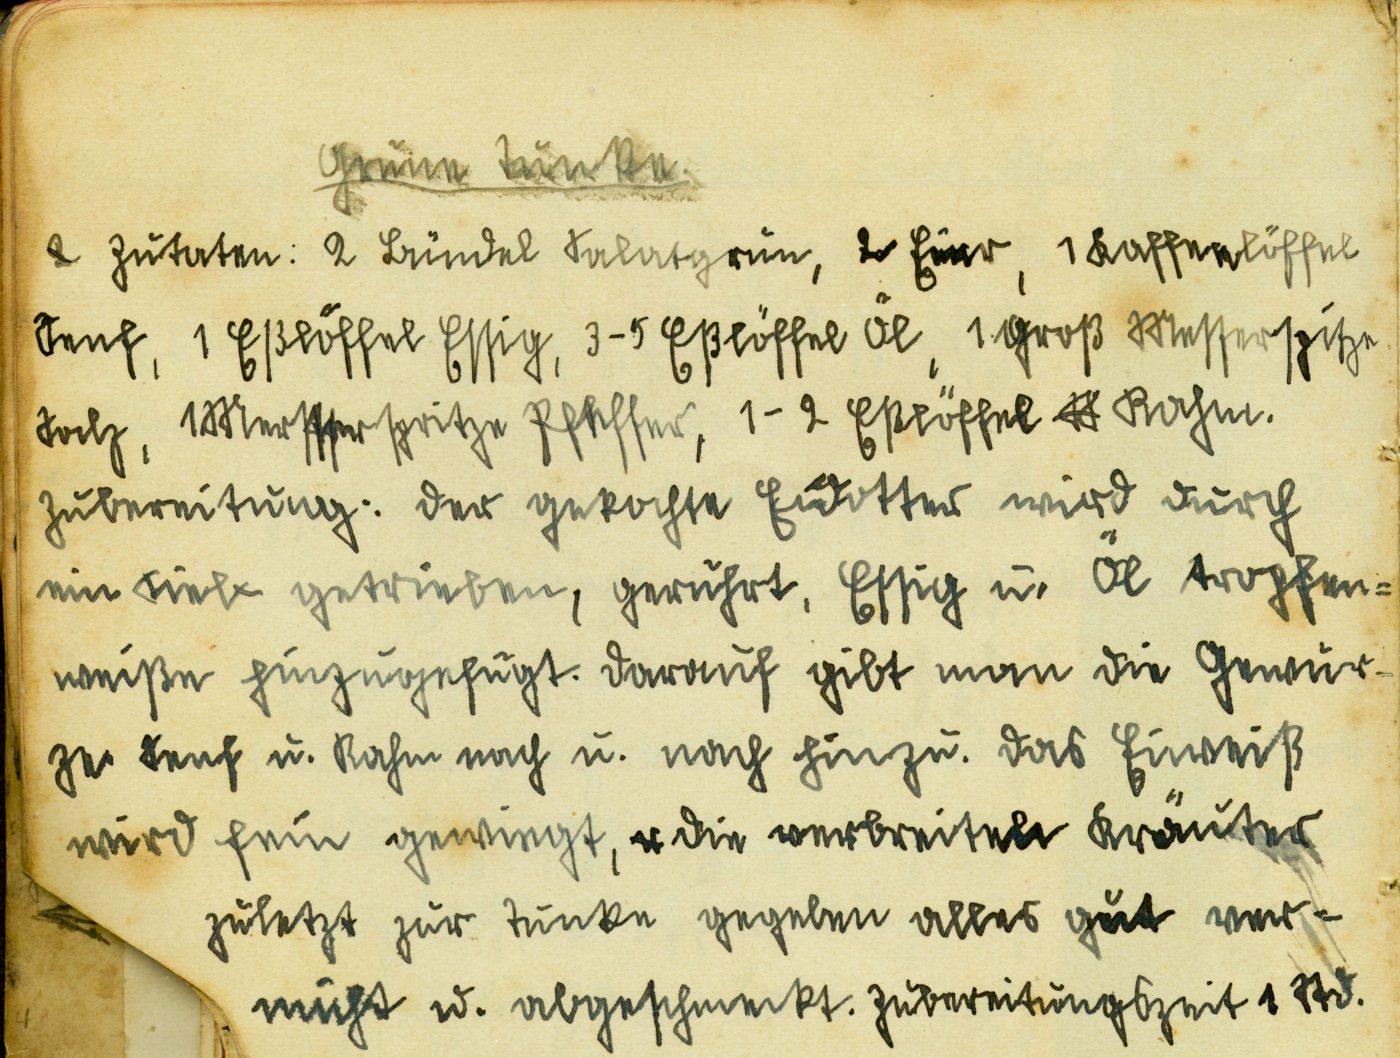 Grüne Sauce Rezept alte Handschrift